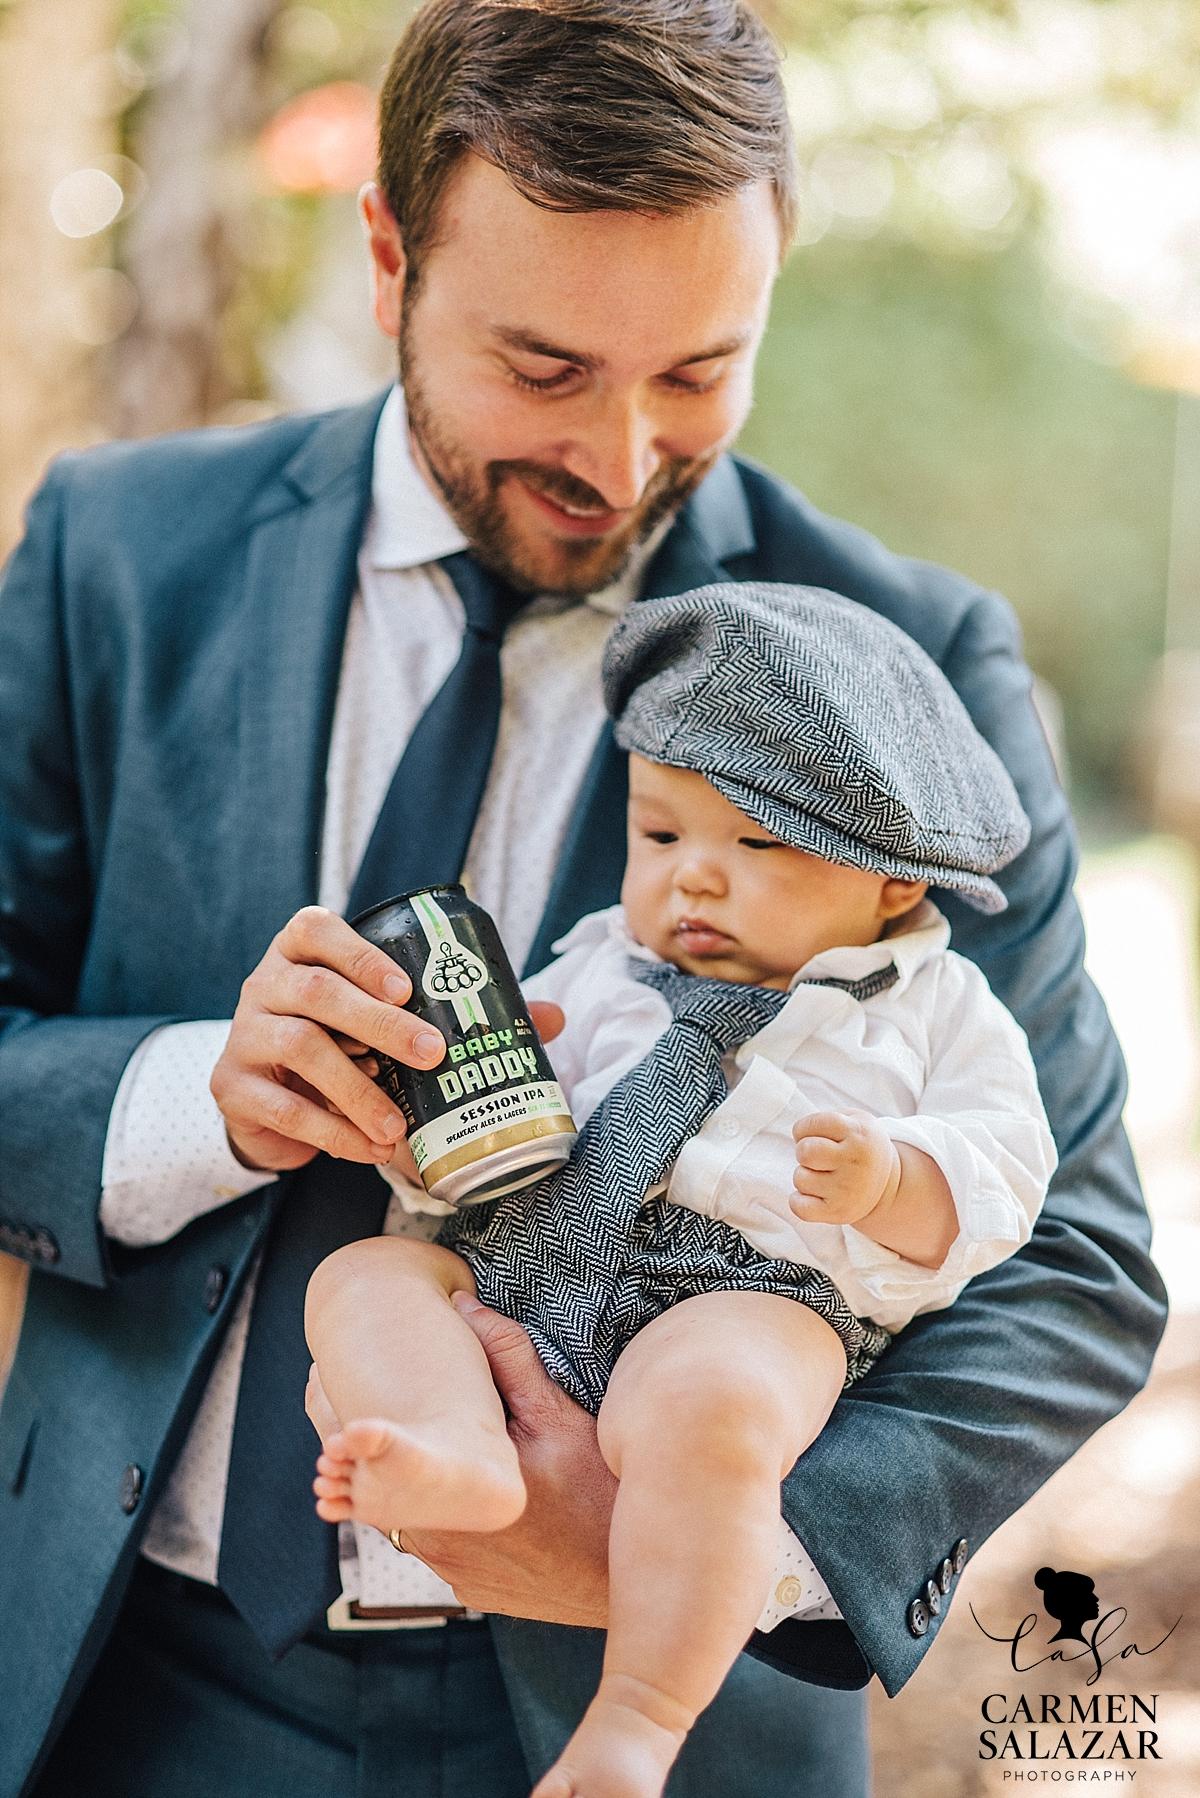 Adorable baby wedding fashion - Carmen Salazar